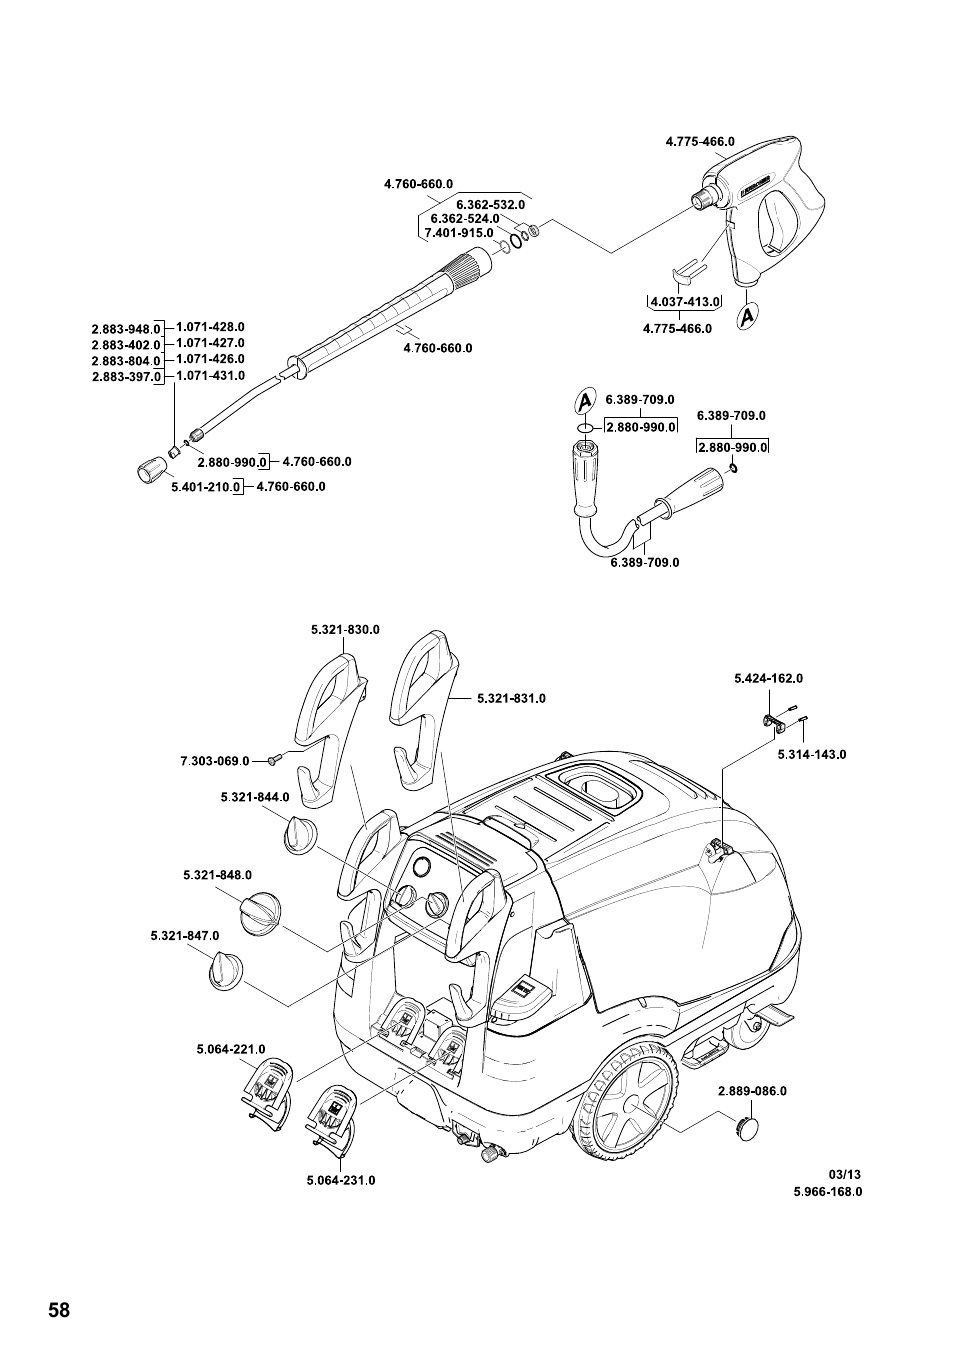 Karcher hds 760 manual